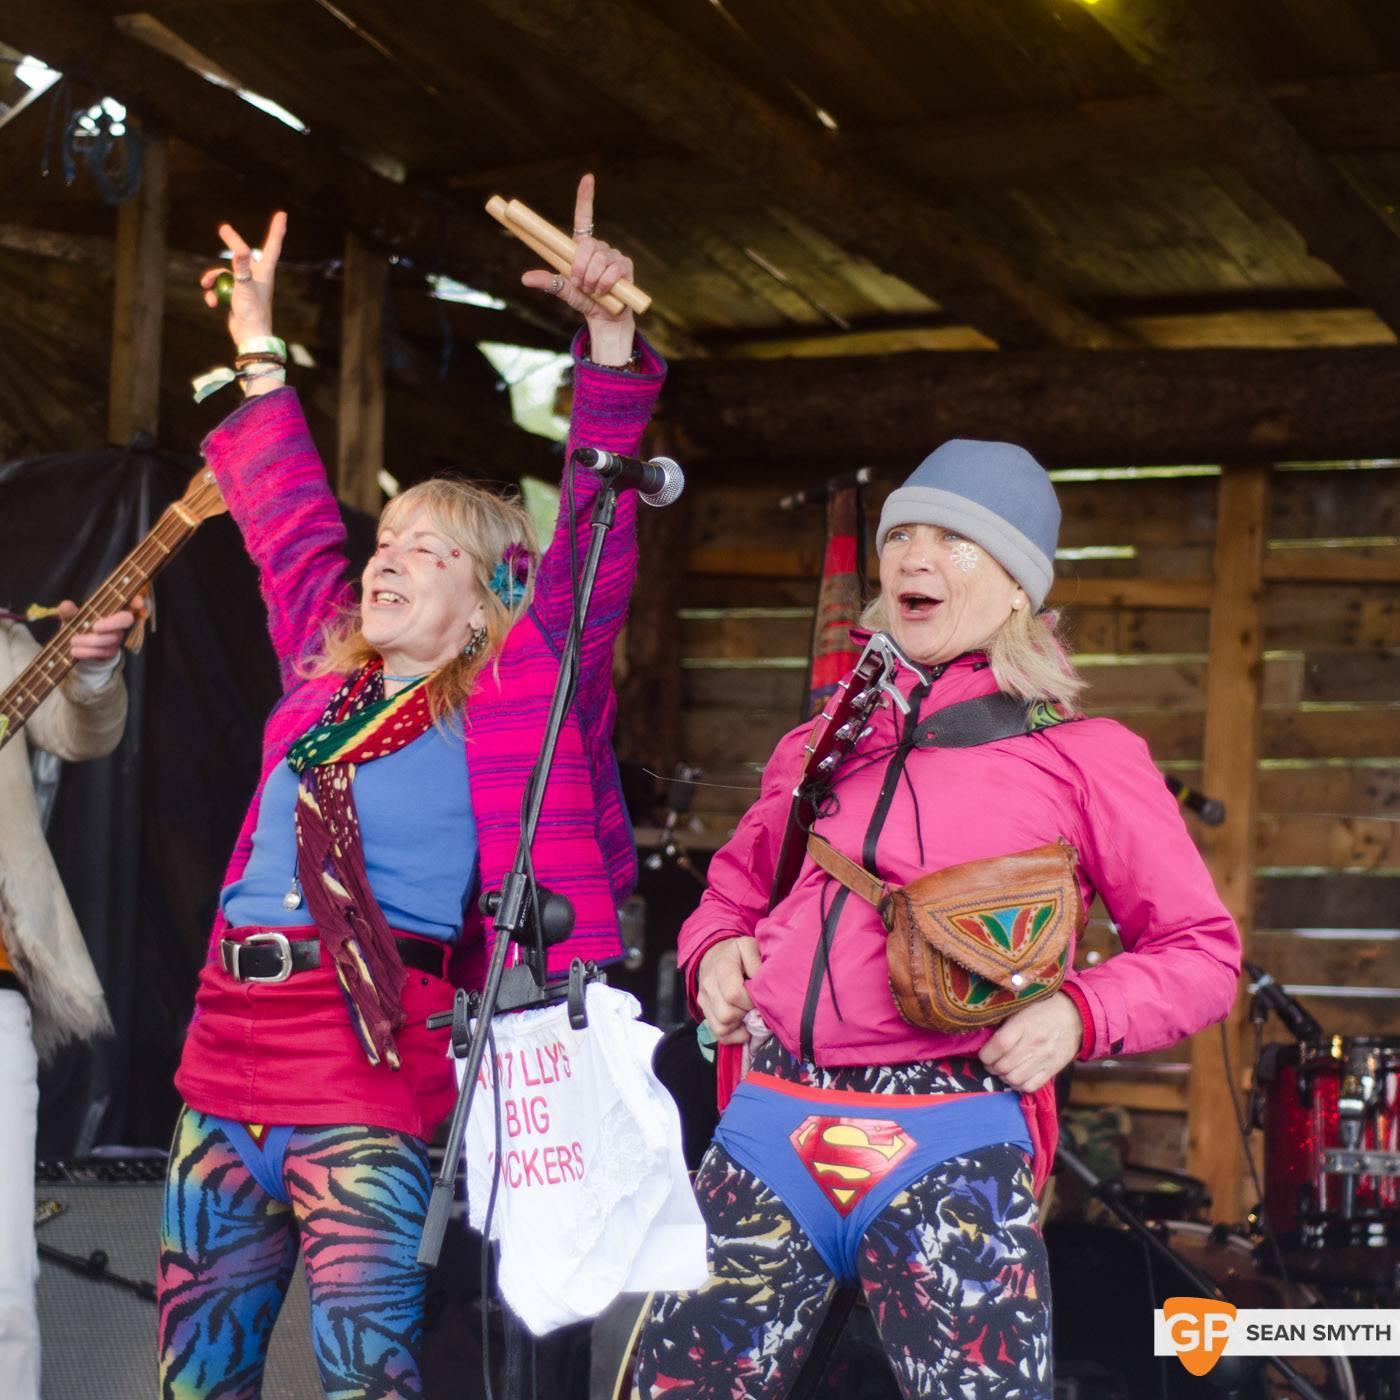 The Twisted Sisters - Saturday at Vantastival by Sean Smyth (1-5-14) (15 of 45)